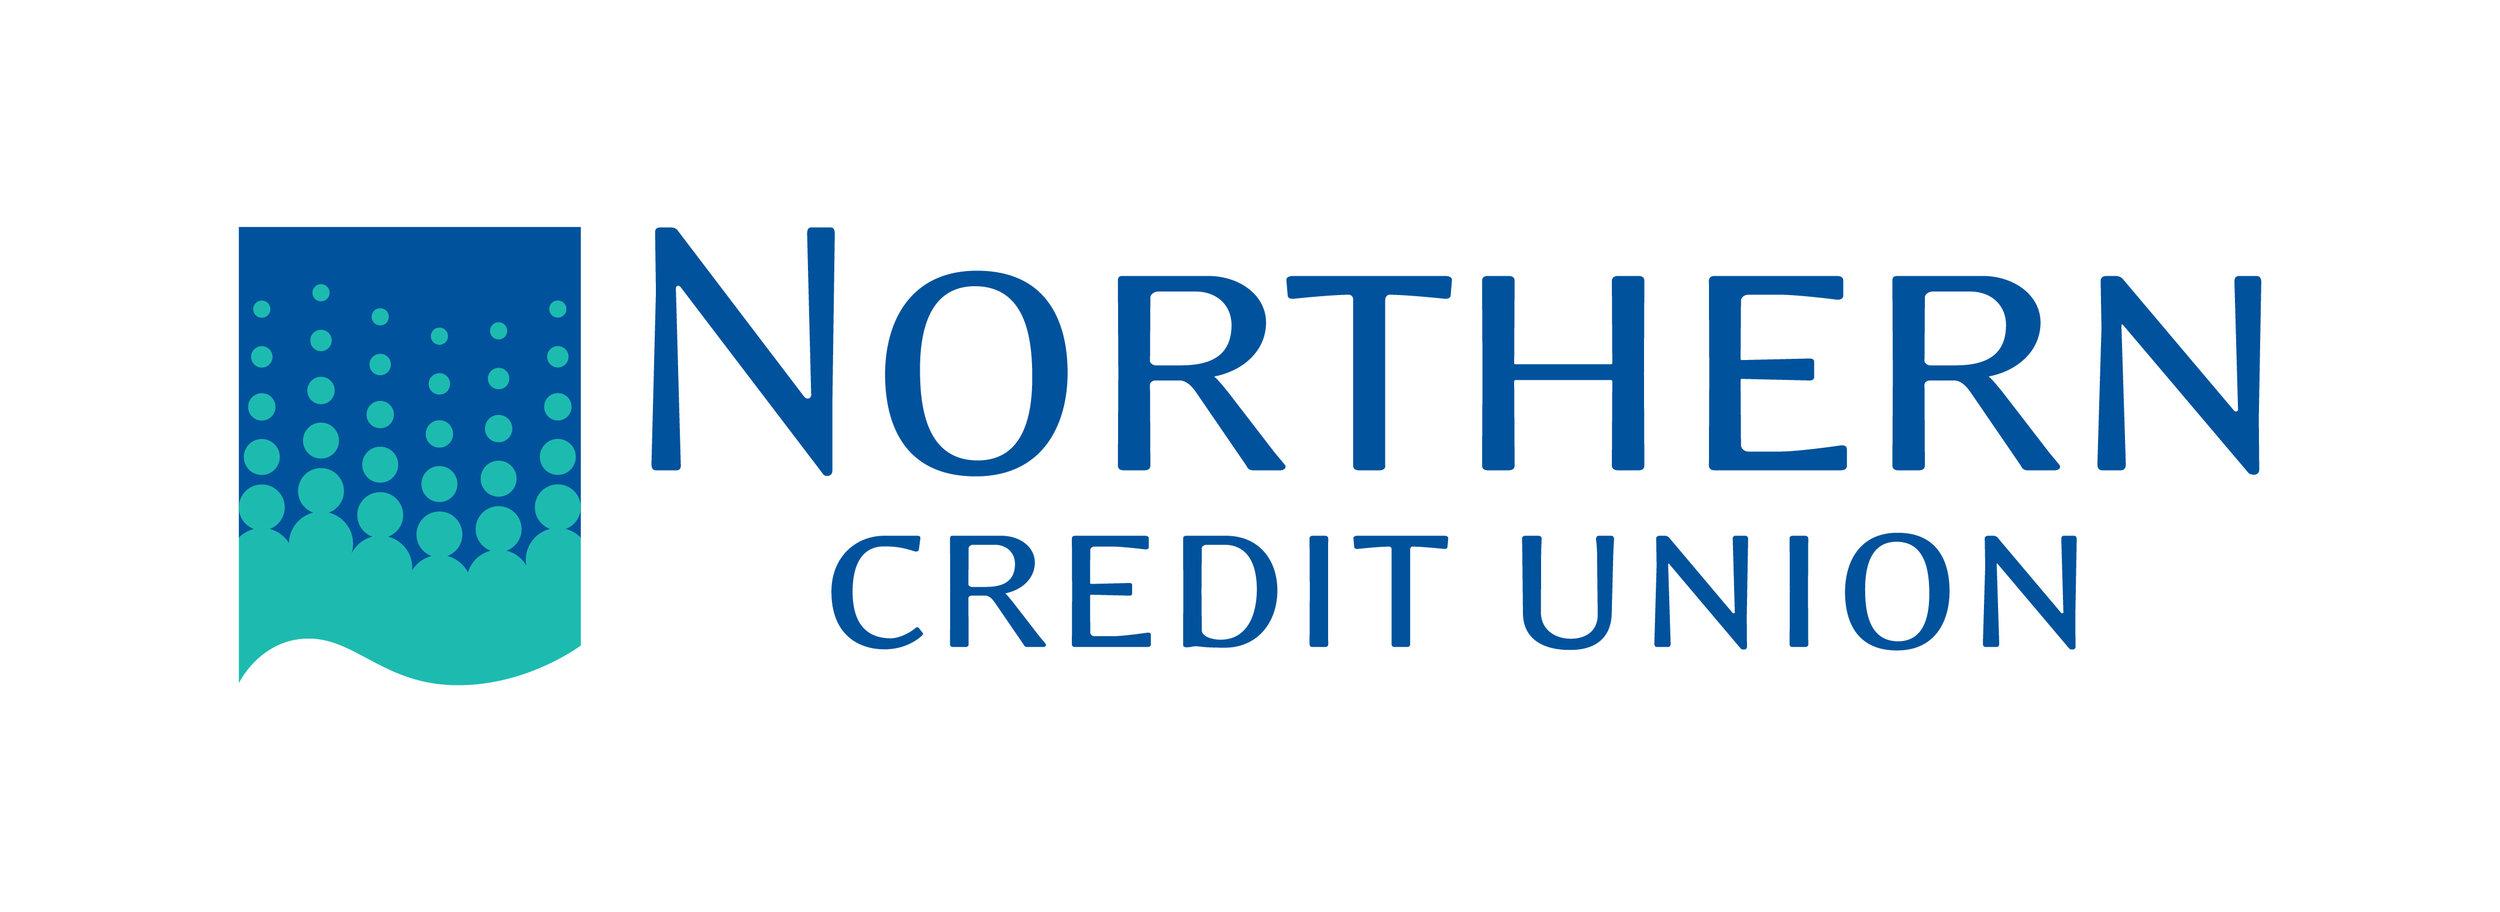 NorthernCreditUnion_RGB_H.JPG